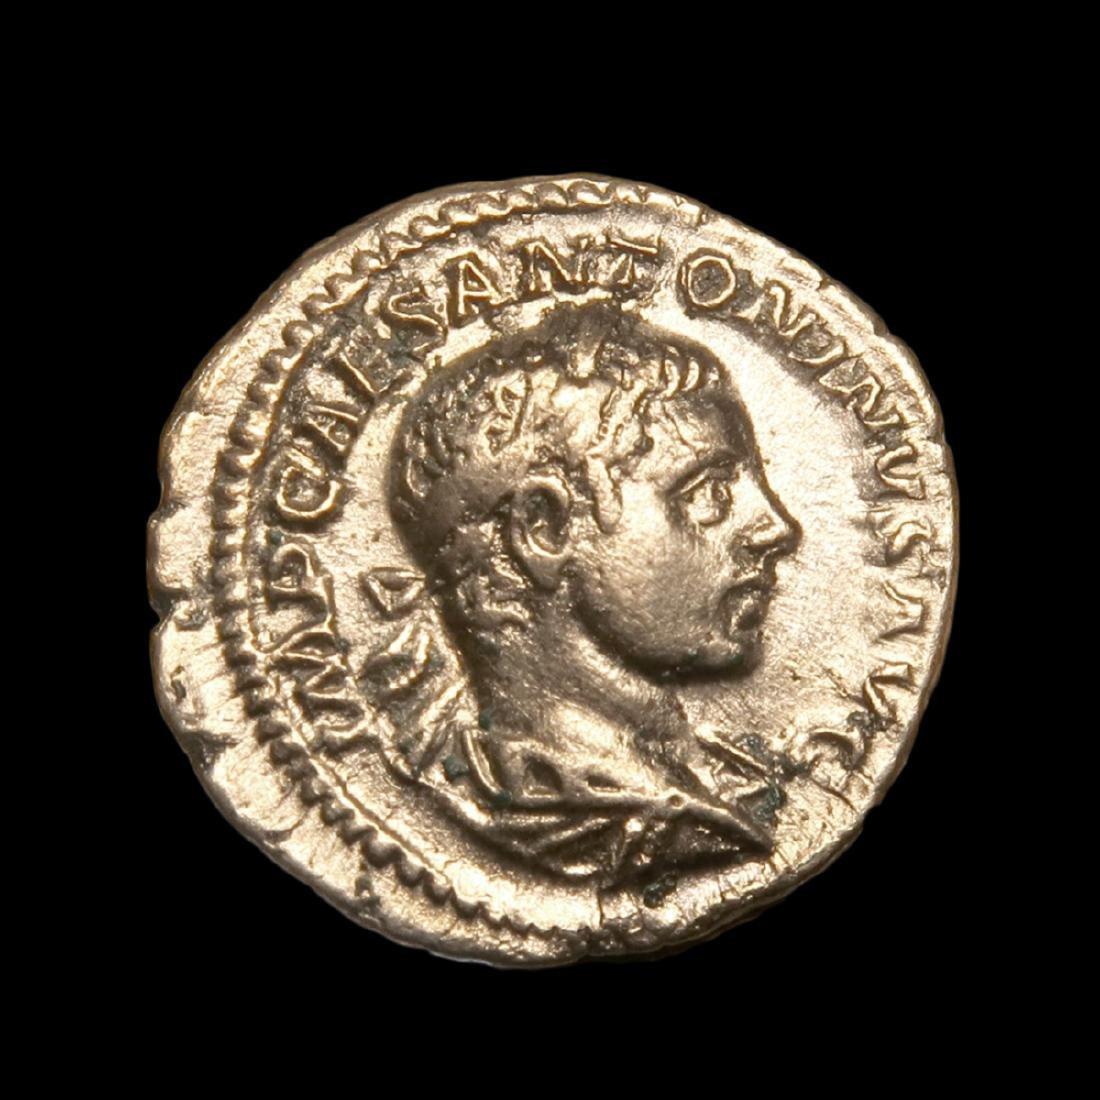 Roman Silver Denarius, Severus Alexander, Mint of Rome